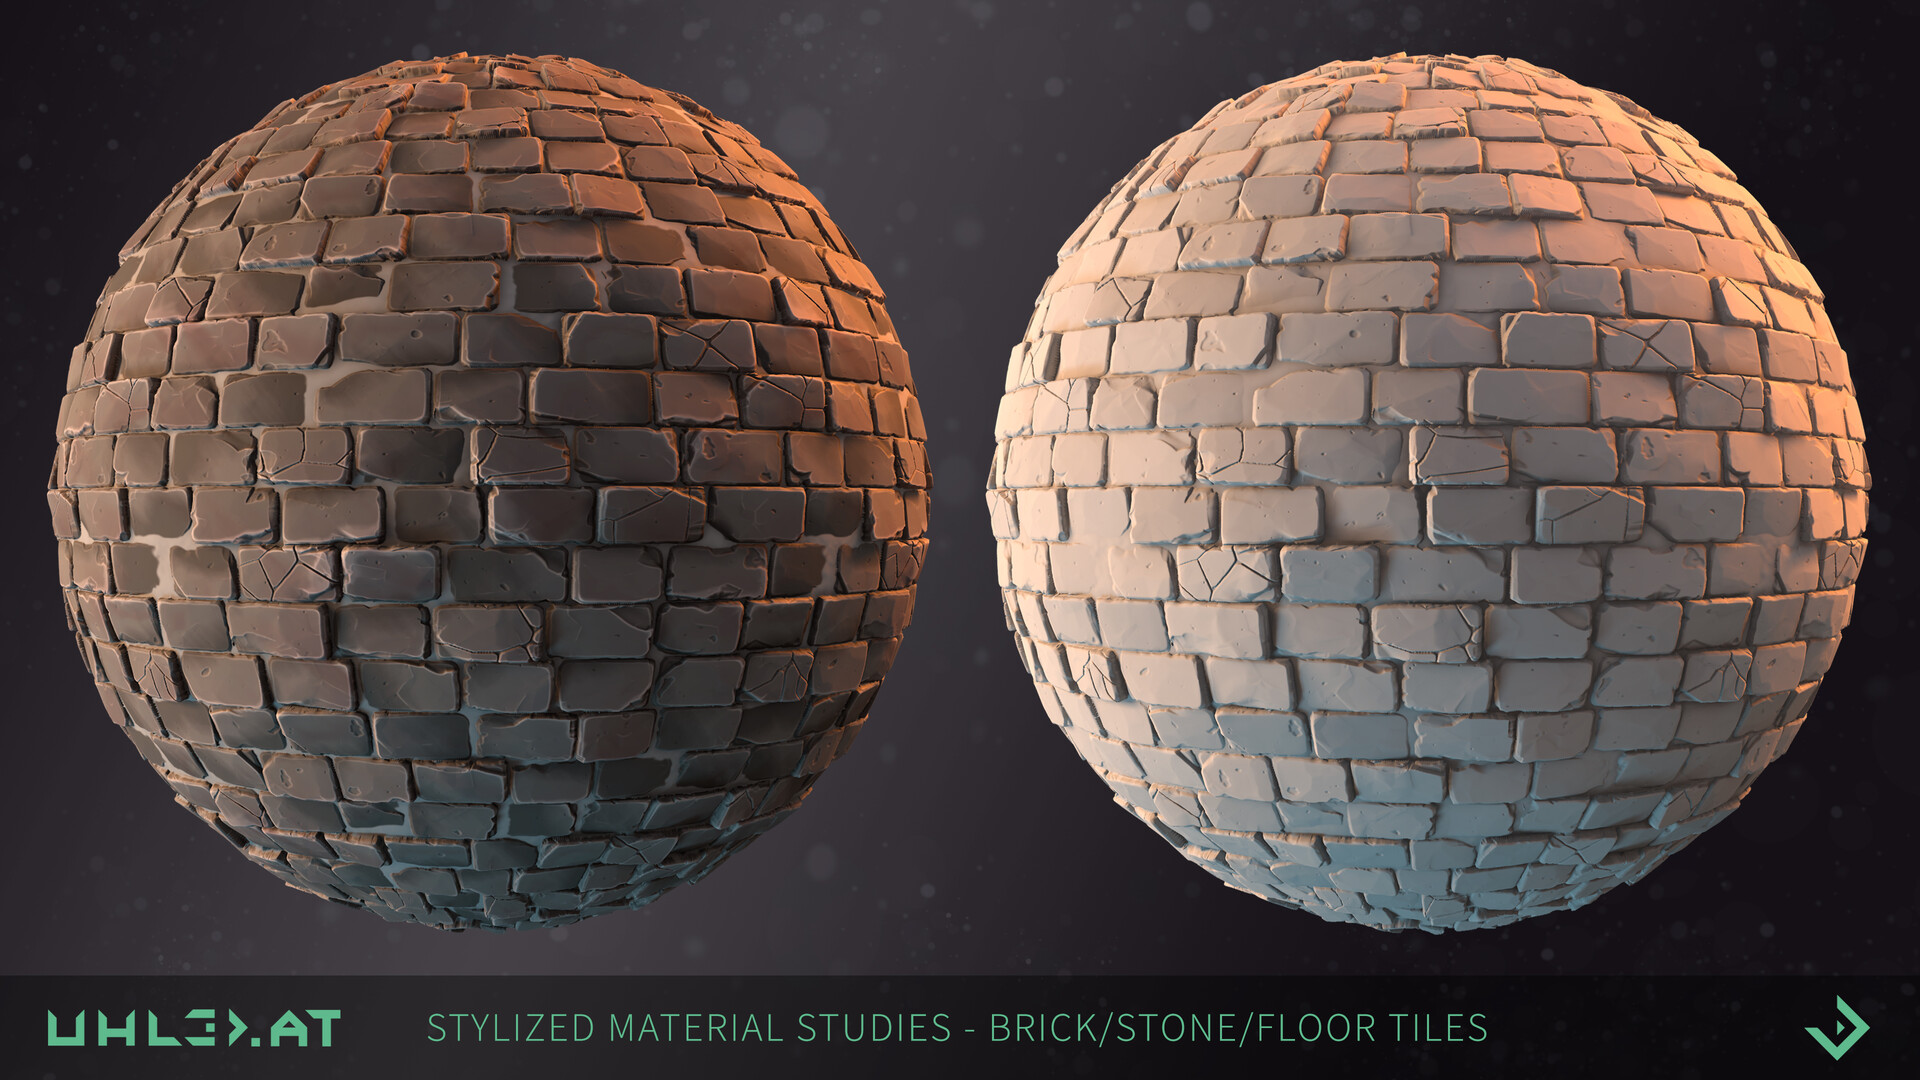 Dominik uhl stylized brick stone studies 02